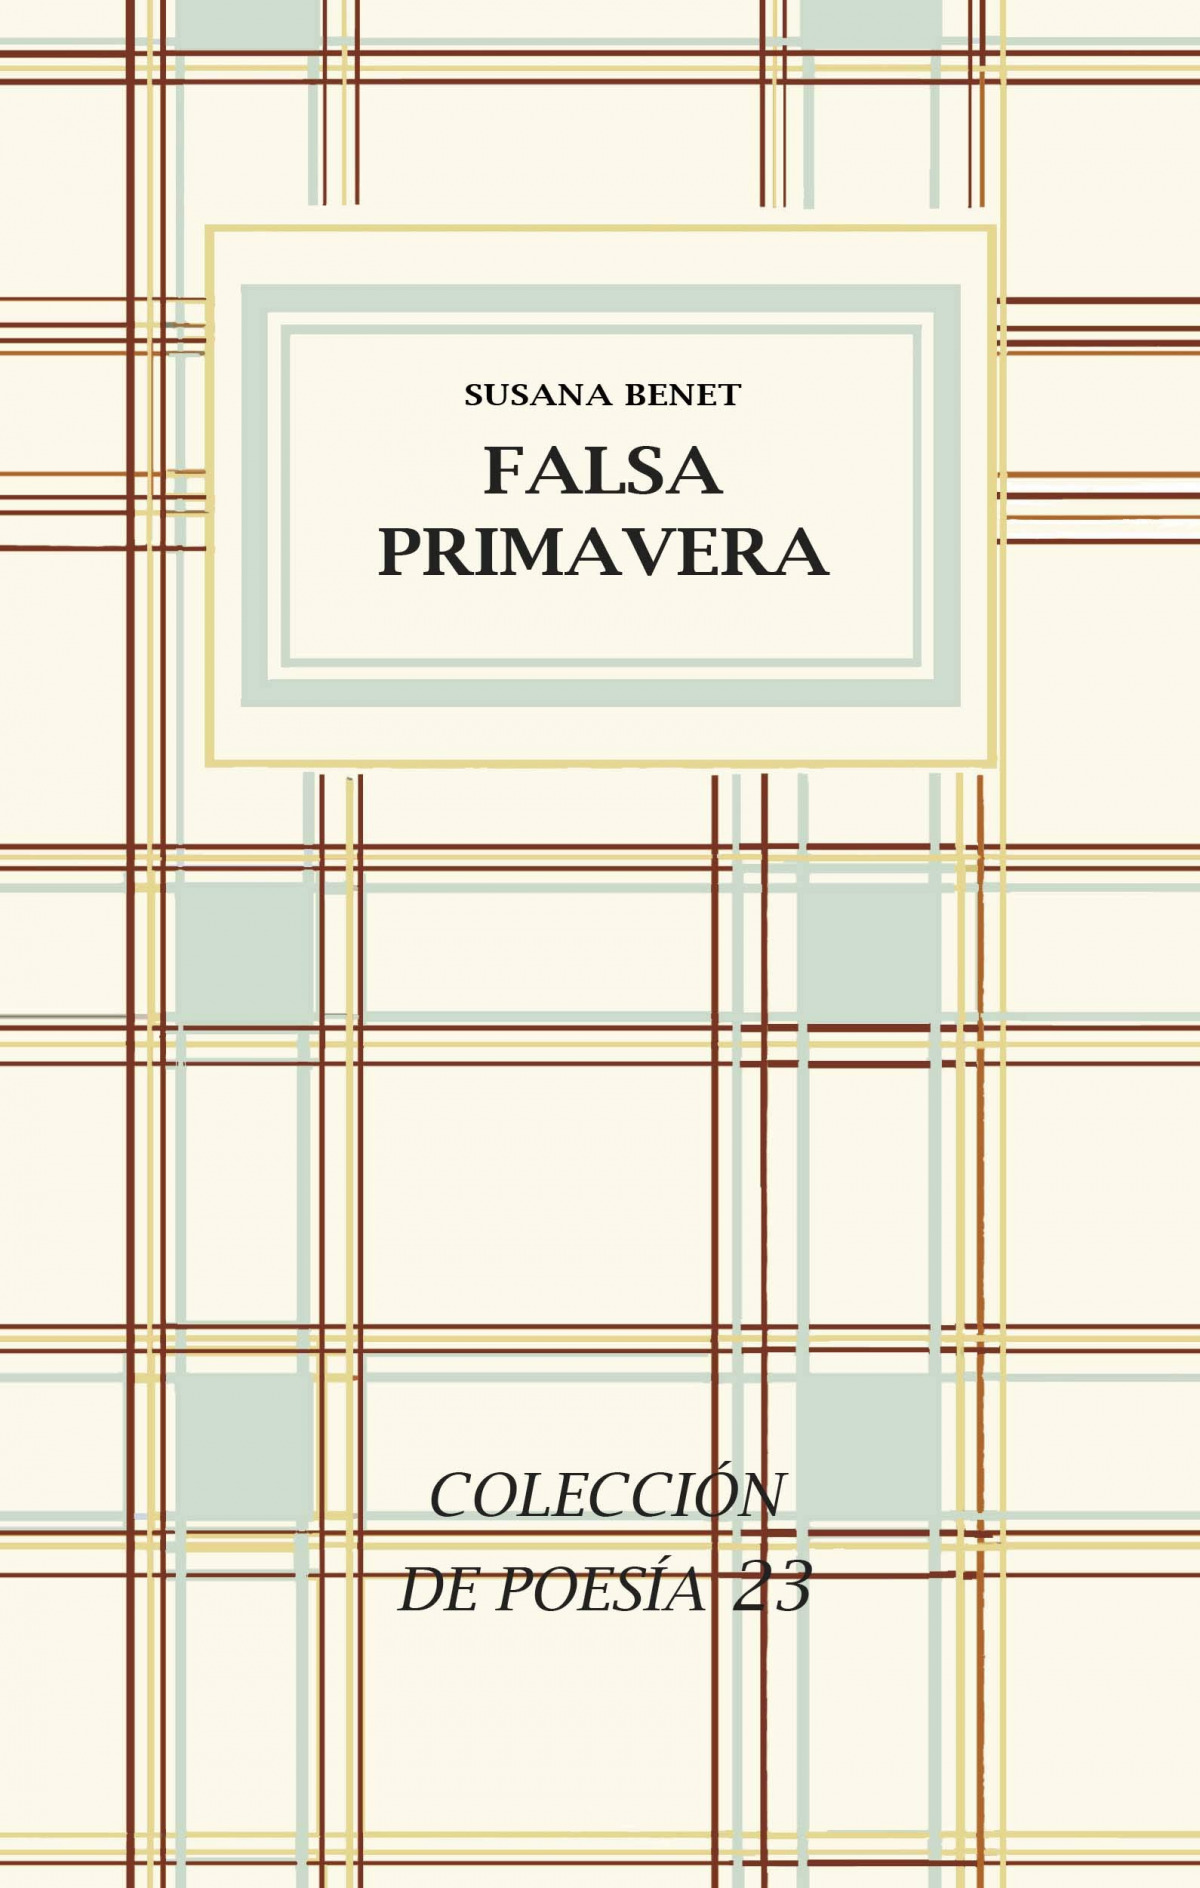 FALSA PRIMAVERA